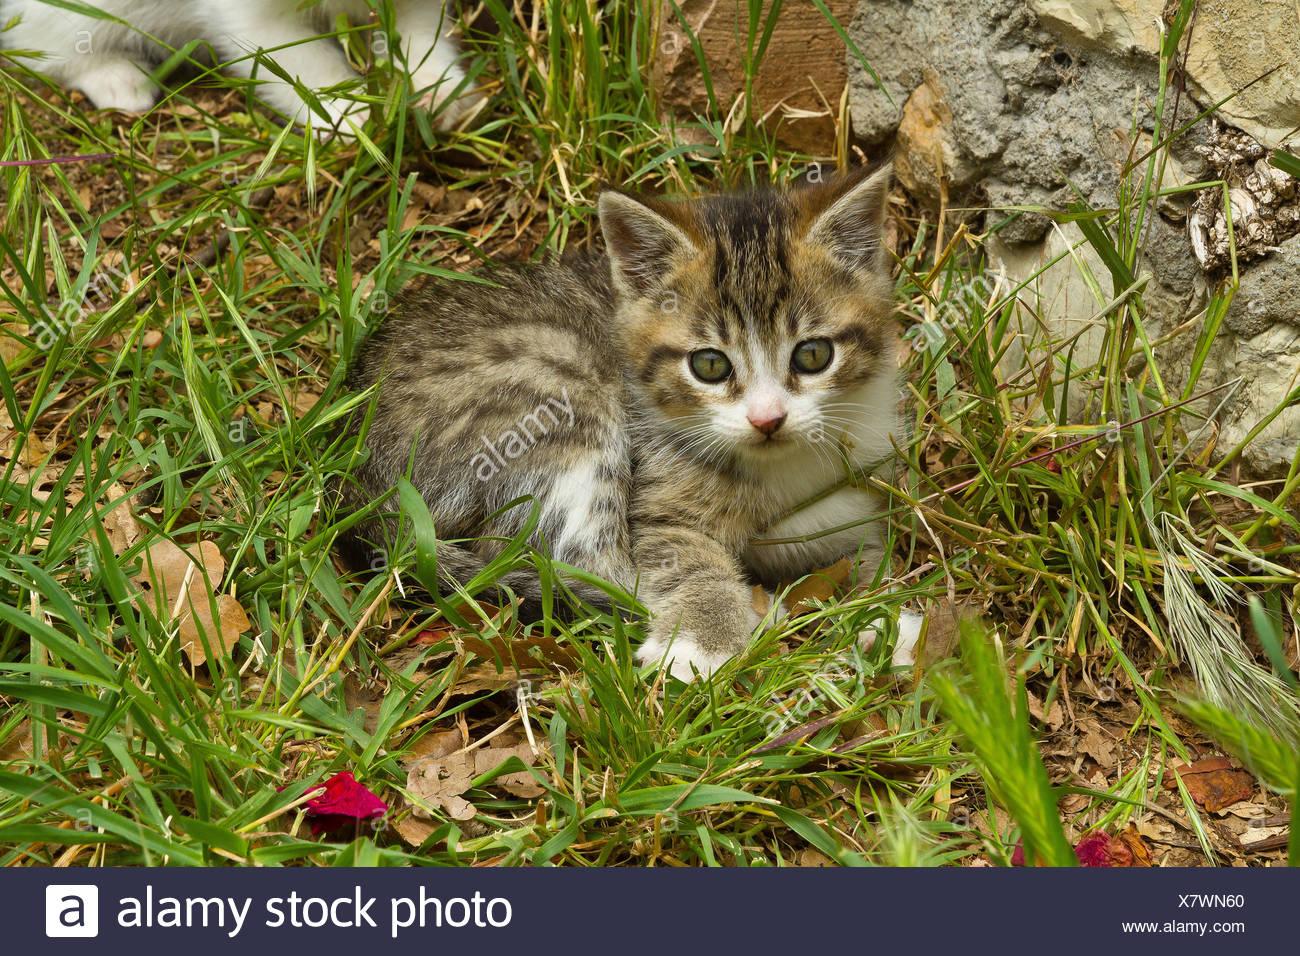 Animal, gato, kitten, jóvenes, jardín, animales domésticos, mascotas, pradera Imagen De Stock